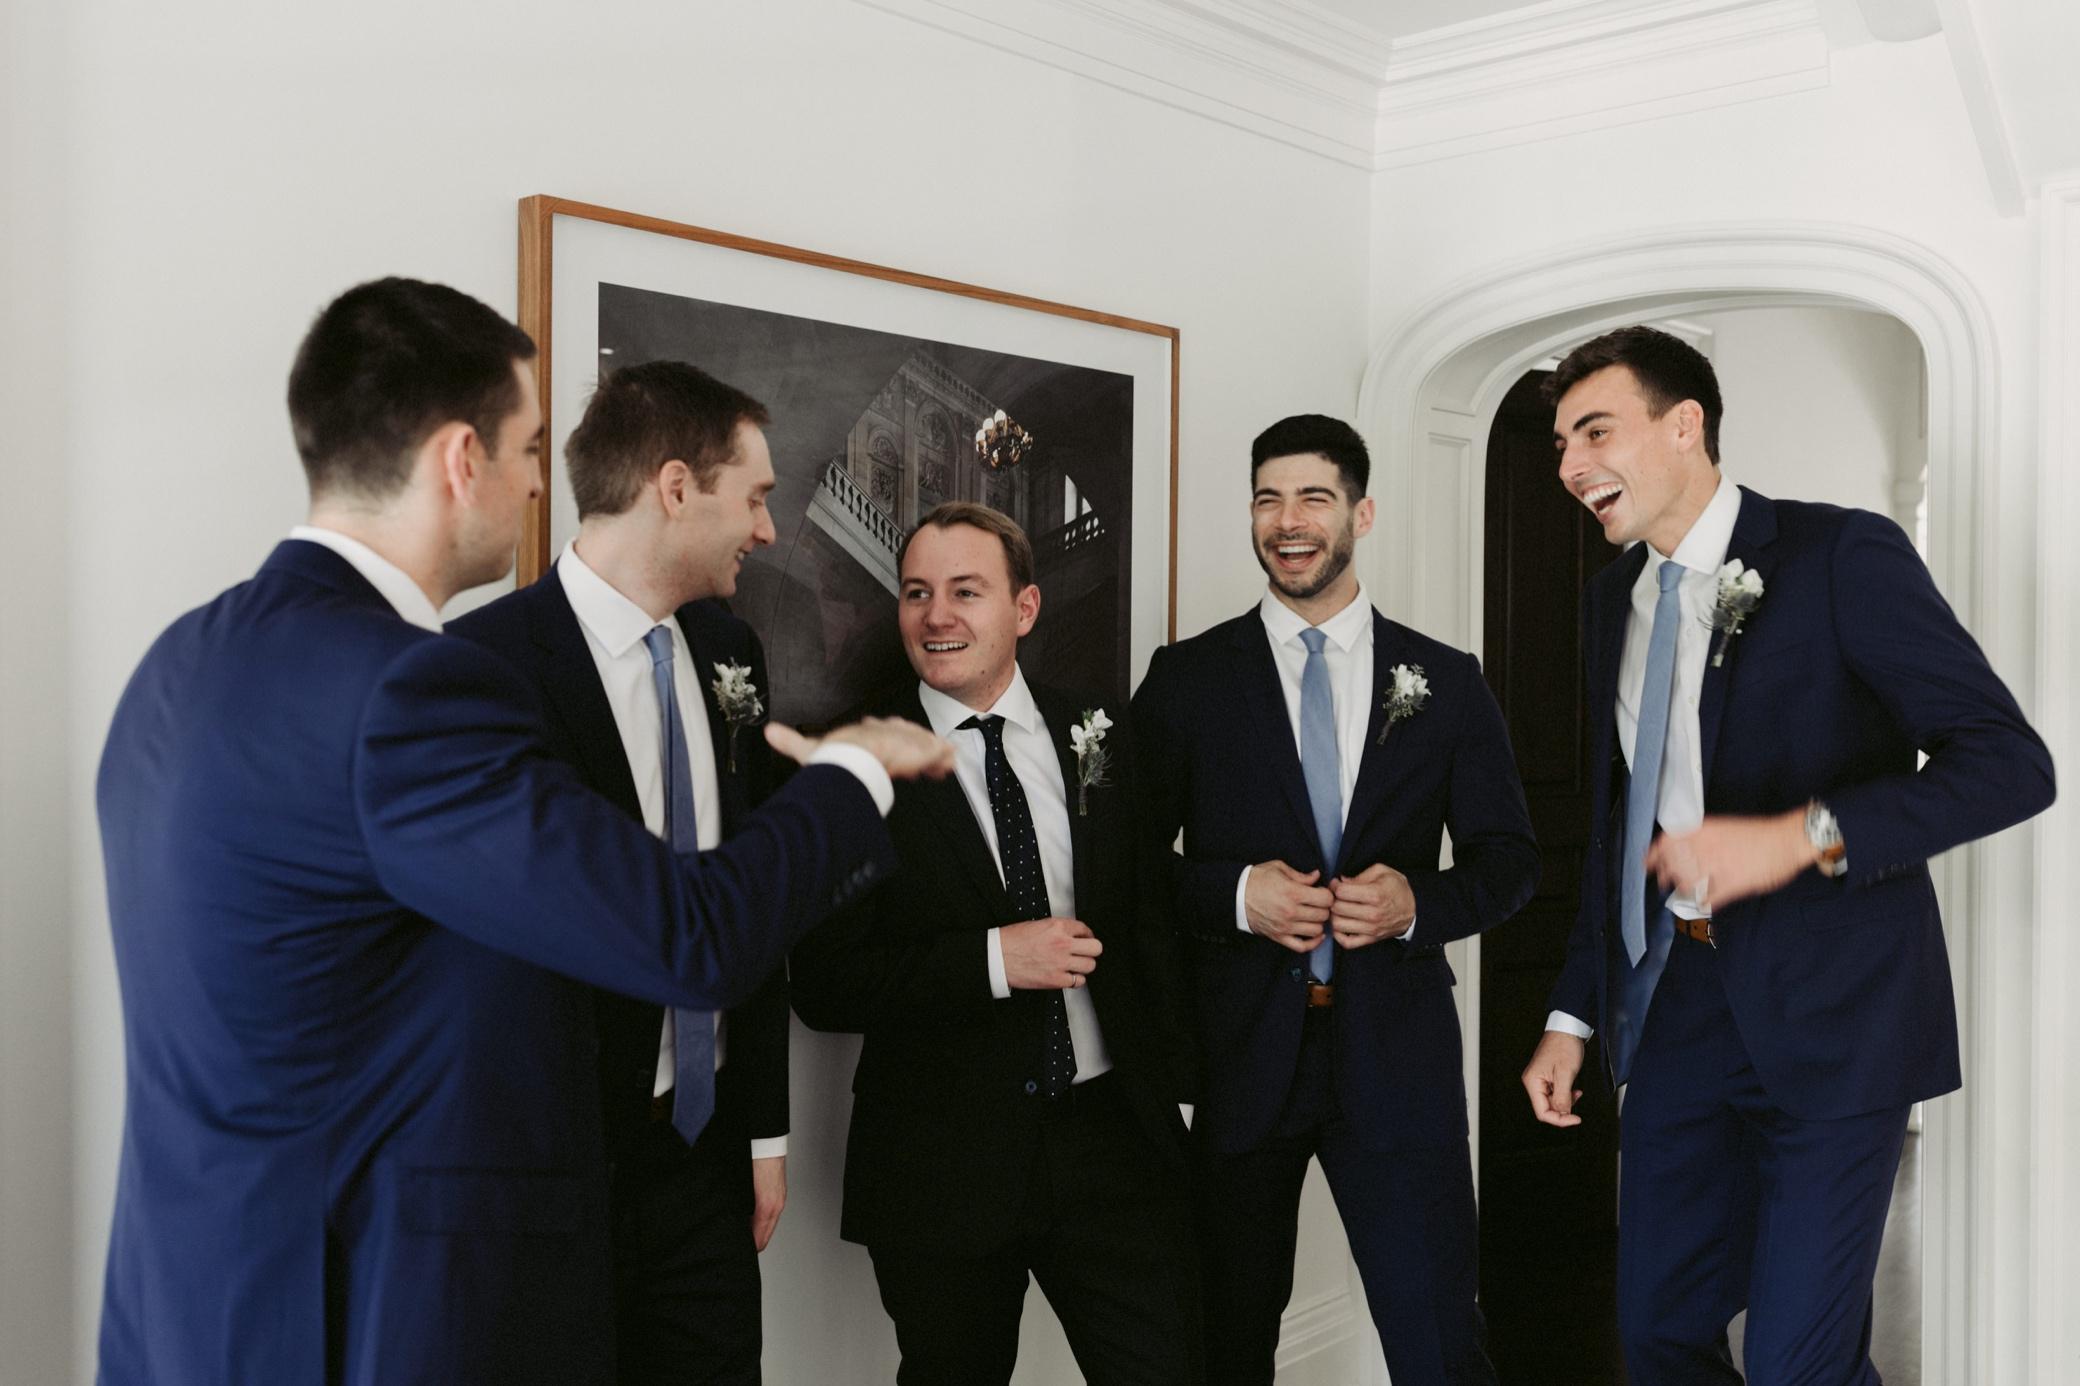 002_The Broadview Hotel Wedding (33 of 913).jpg